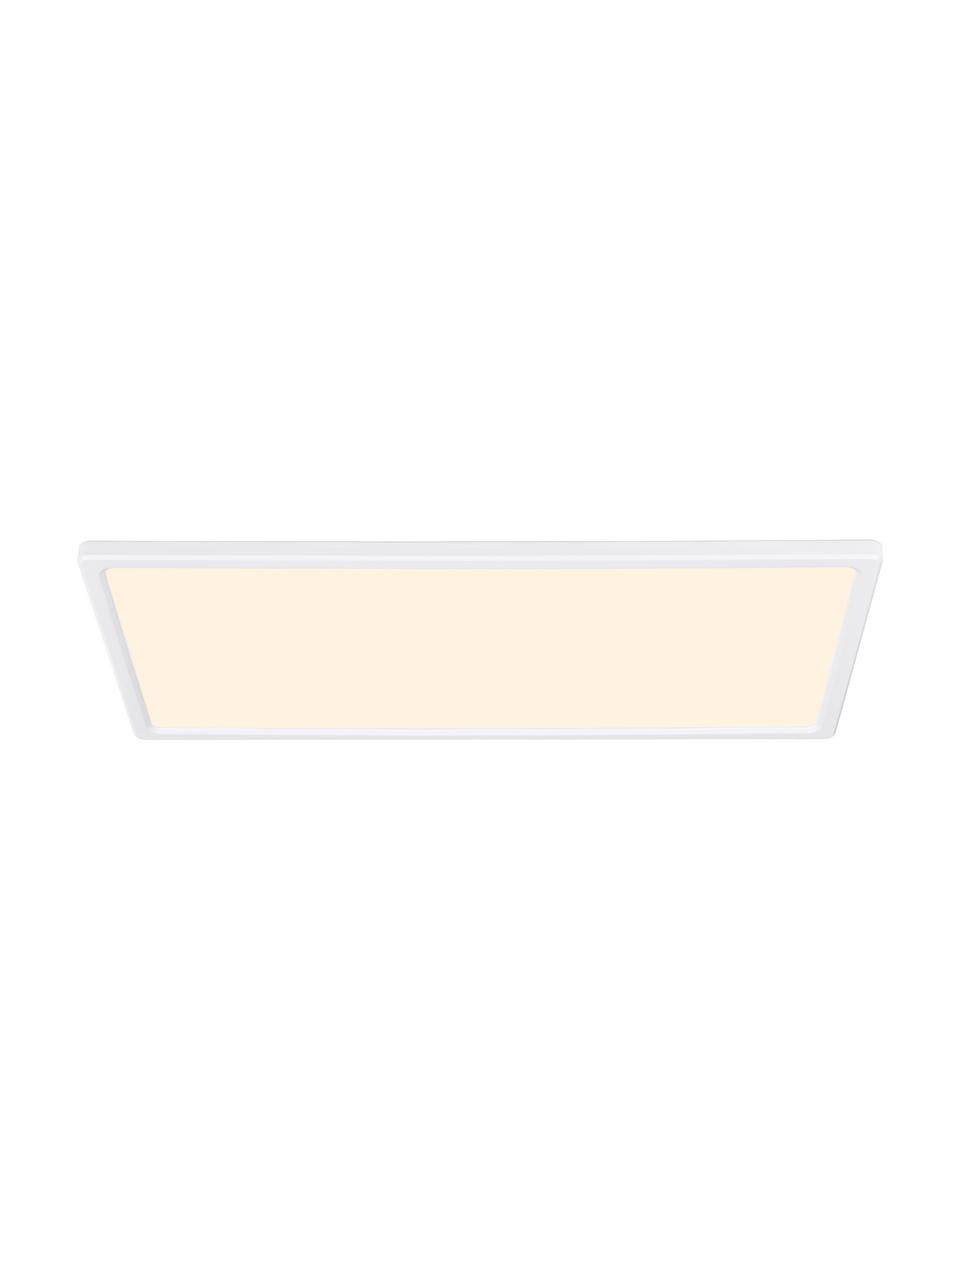 Plafoniera a LED dimmerabile Harlow, Paralume: materiale sintetico, Struttura: materiale sintetico, Bianco, Larg. 60 x Alt. 3 cm